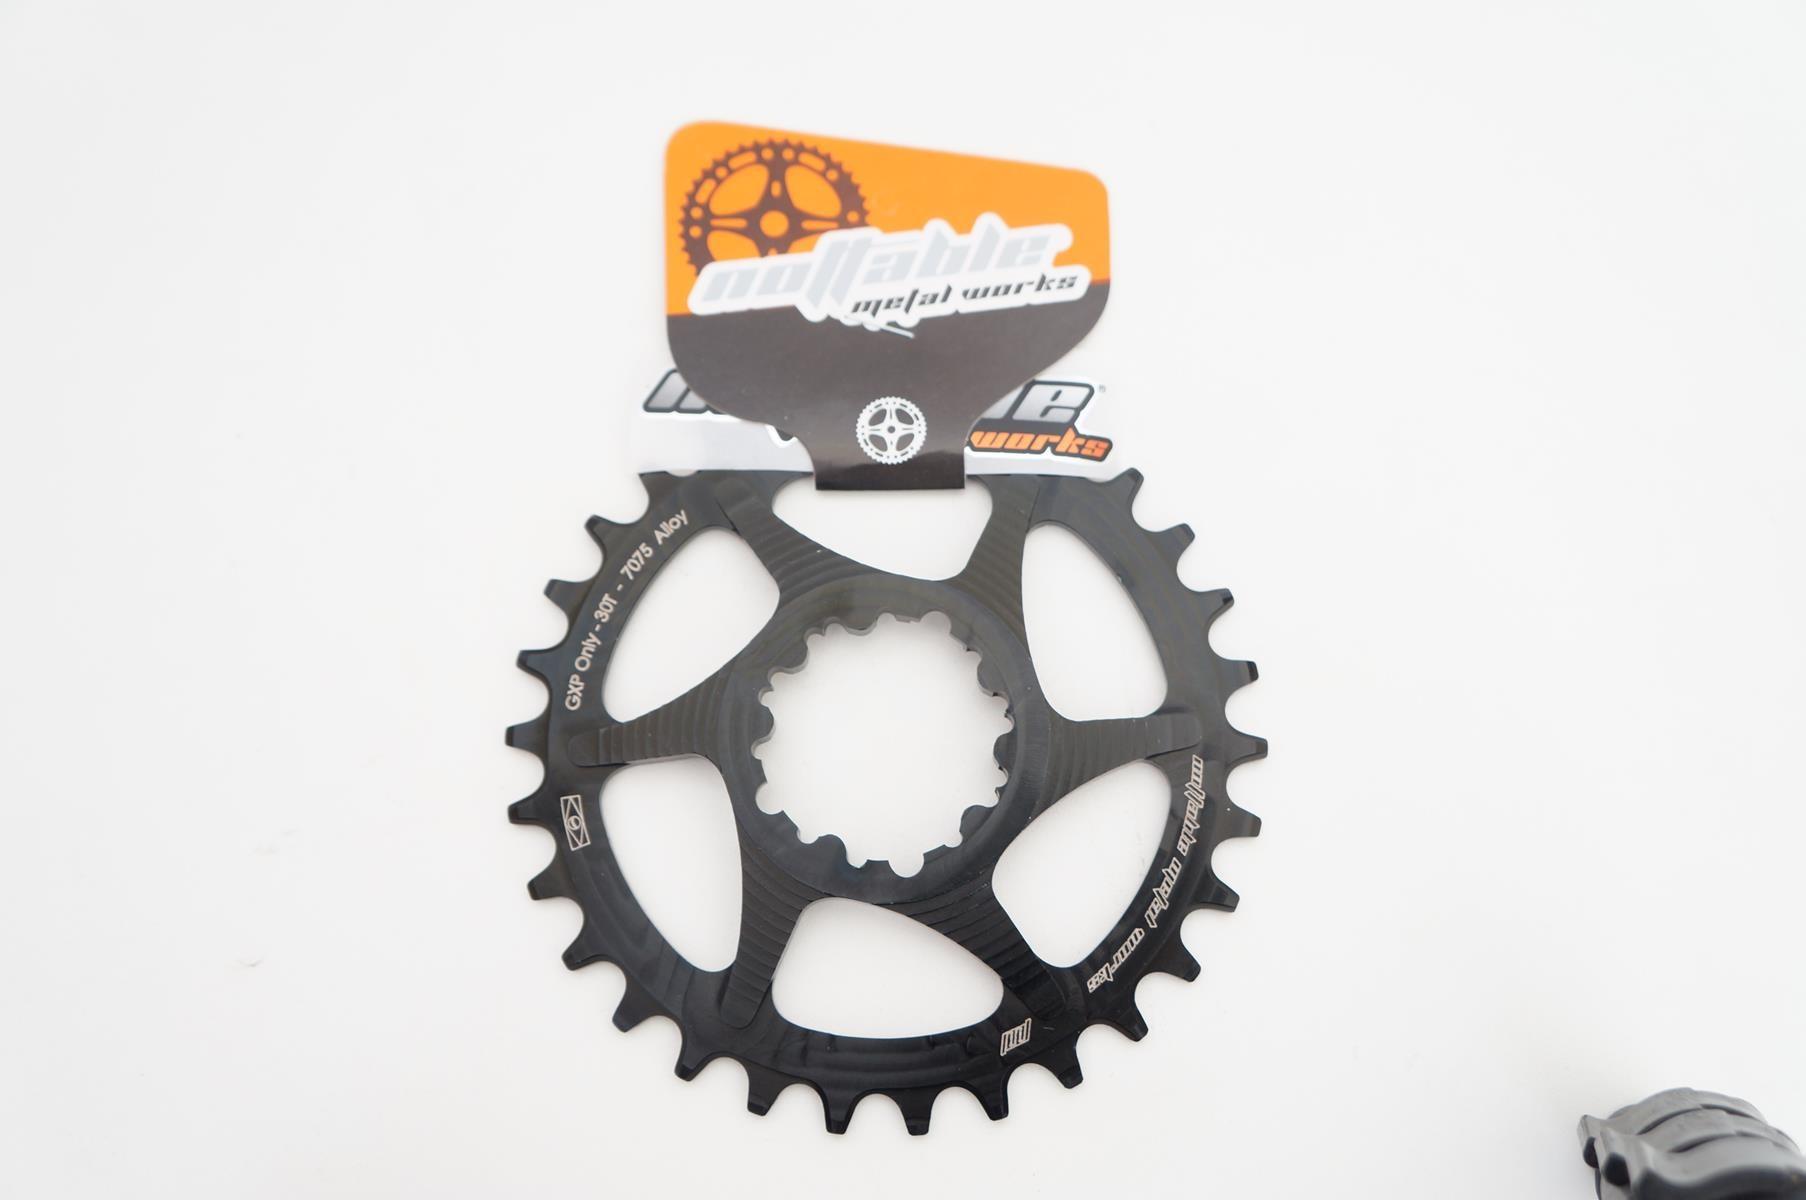 Coroa Bicicleta Nottable para Sram GXP 30t Direct Mount 6mm Off Set Para Uso 1x11